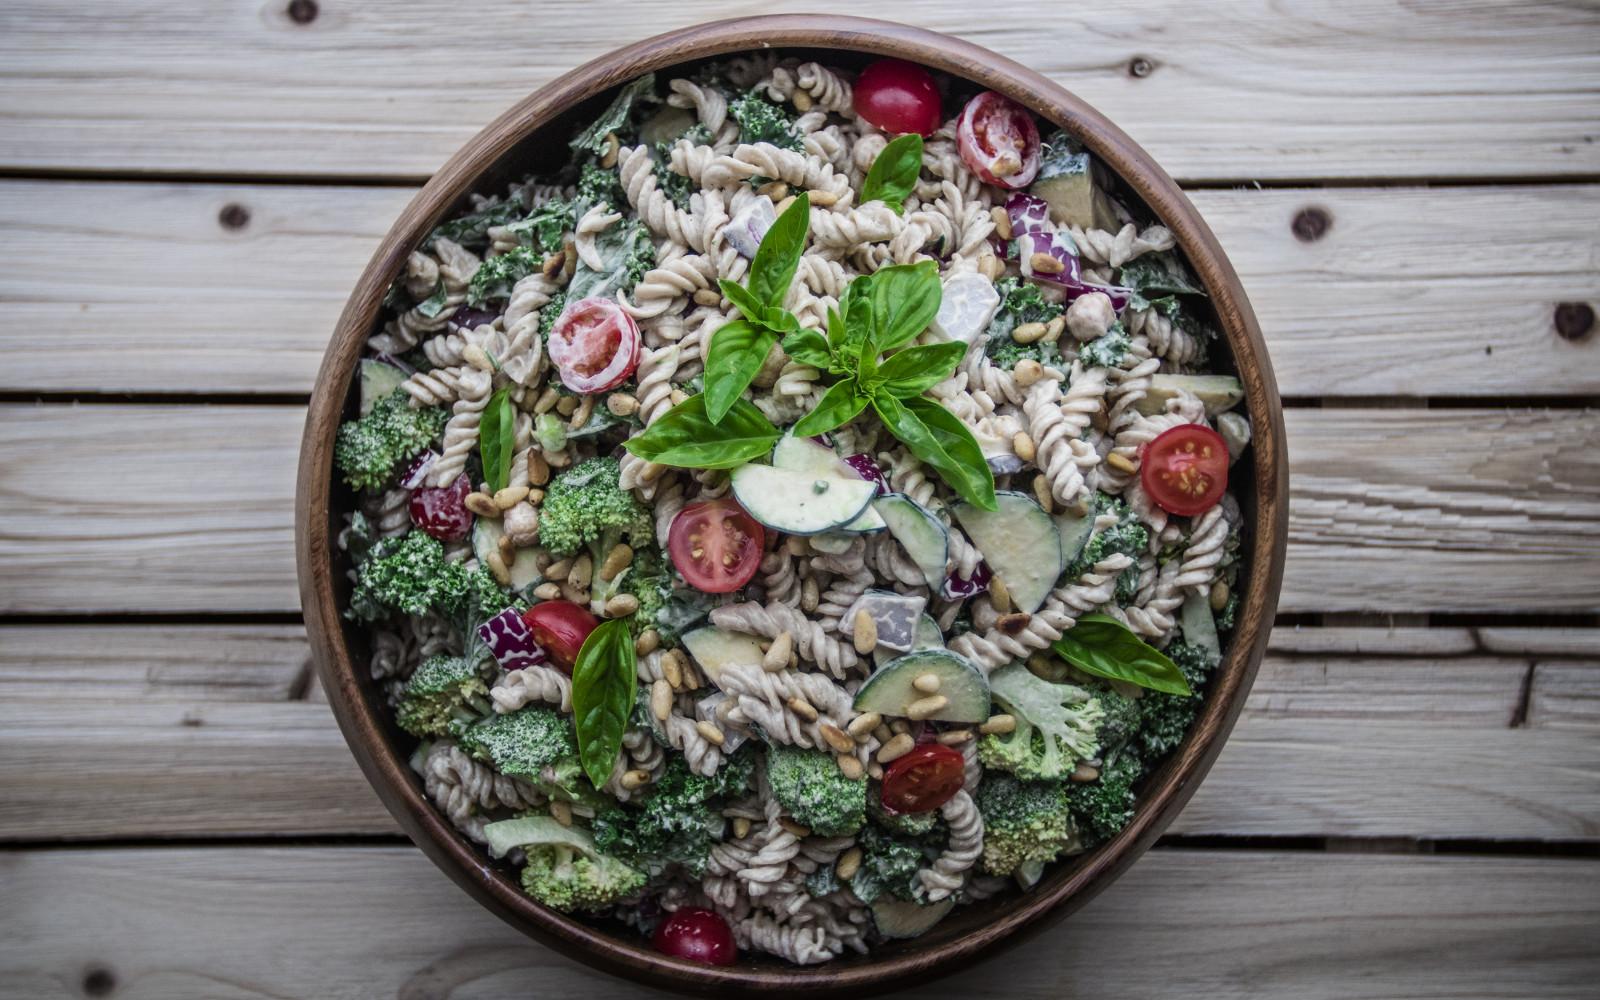 Garden Picnic Pasta Salad with Veggies, Herbs, and Orange-Miso Tahini Dressing